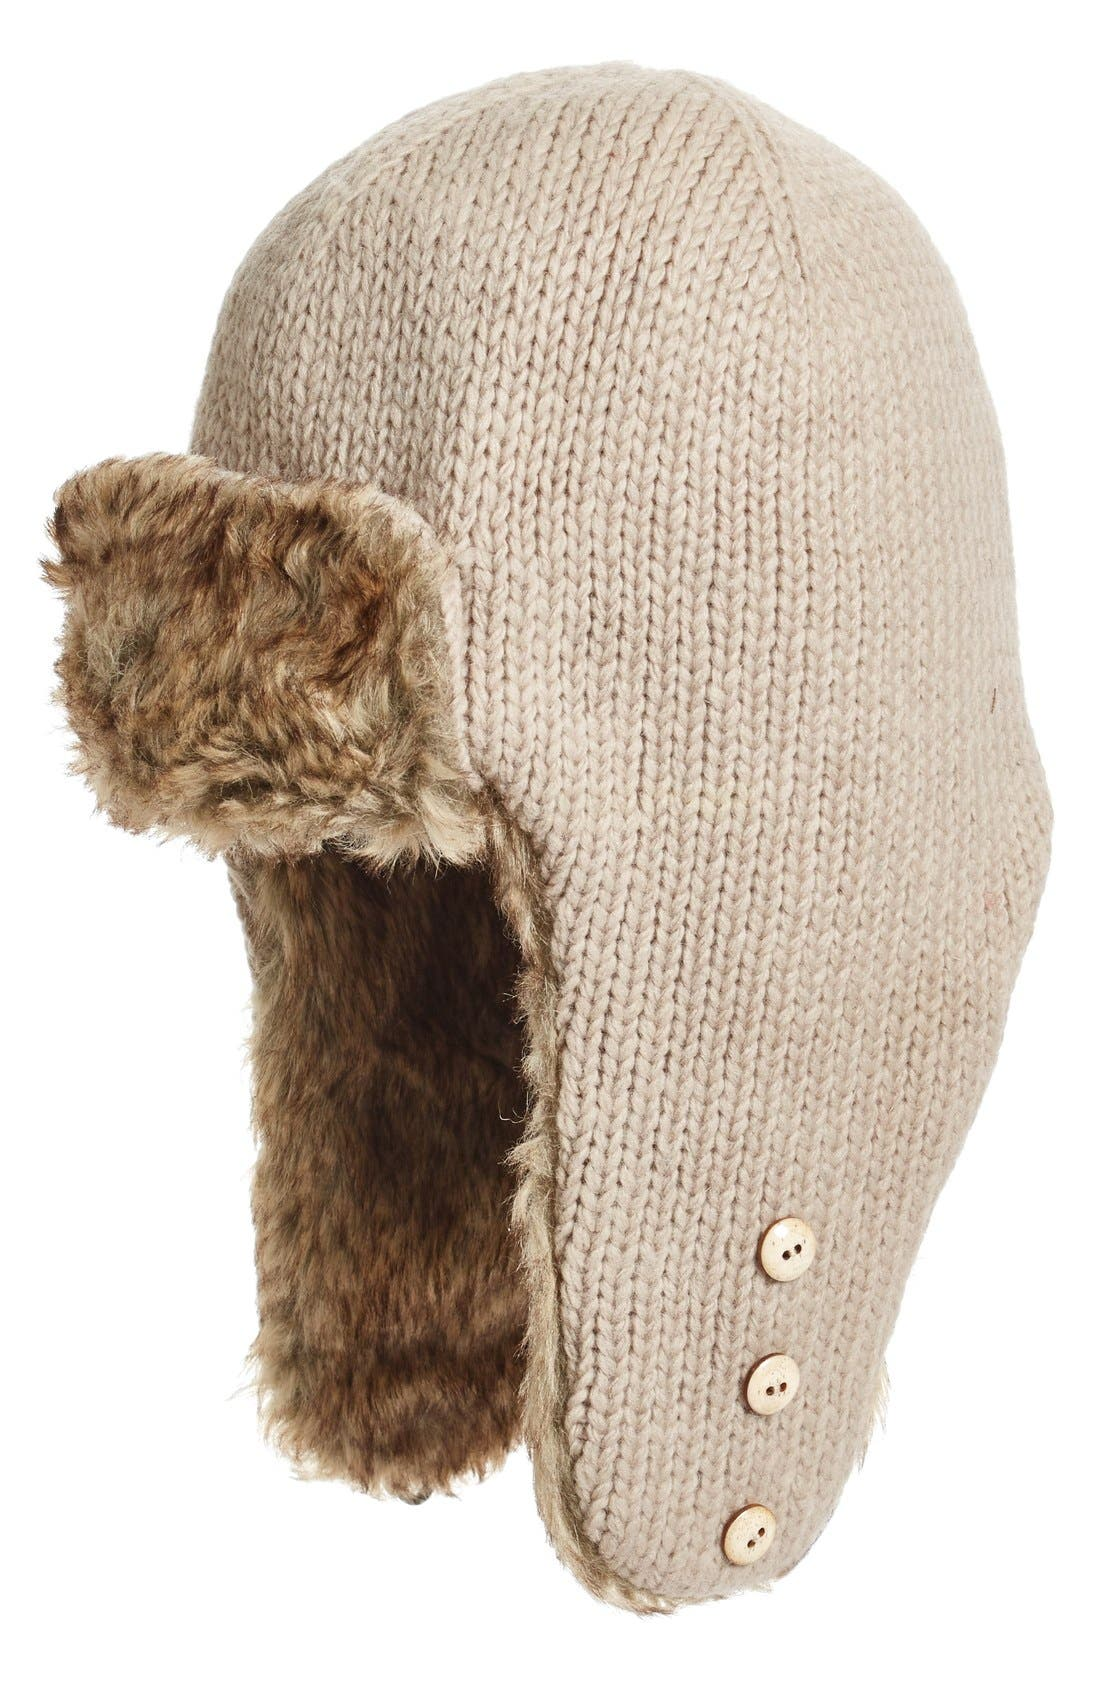 Earflap Hat with Faux Fur Trim,                             Main thumbnail 1, color,                             Oatmeal